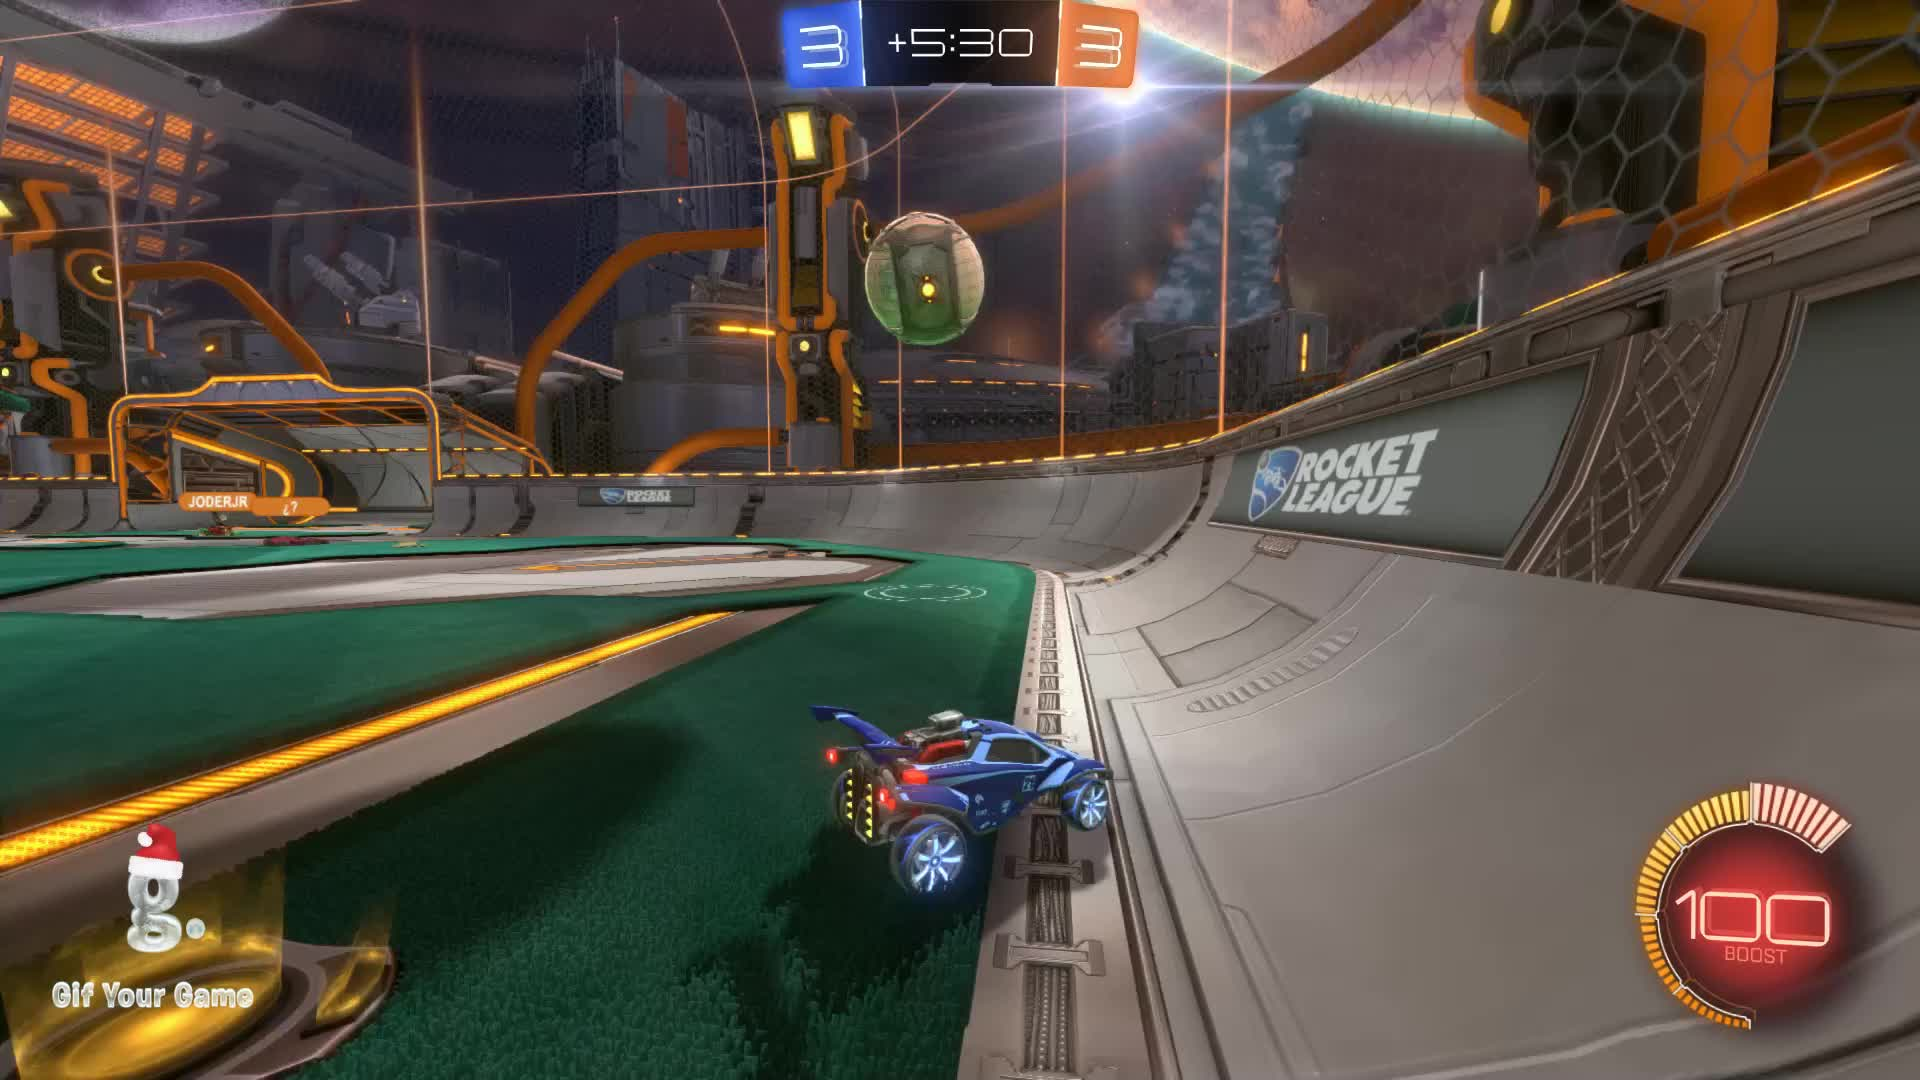 Gif Your Game, GifYourGame, Goal, Rocket League, RocketLeague, beta boy ice poseidon, Goal 7: beta boy ice poseidon GIFs